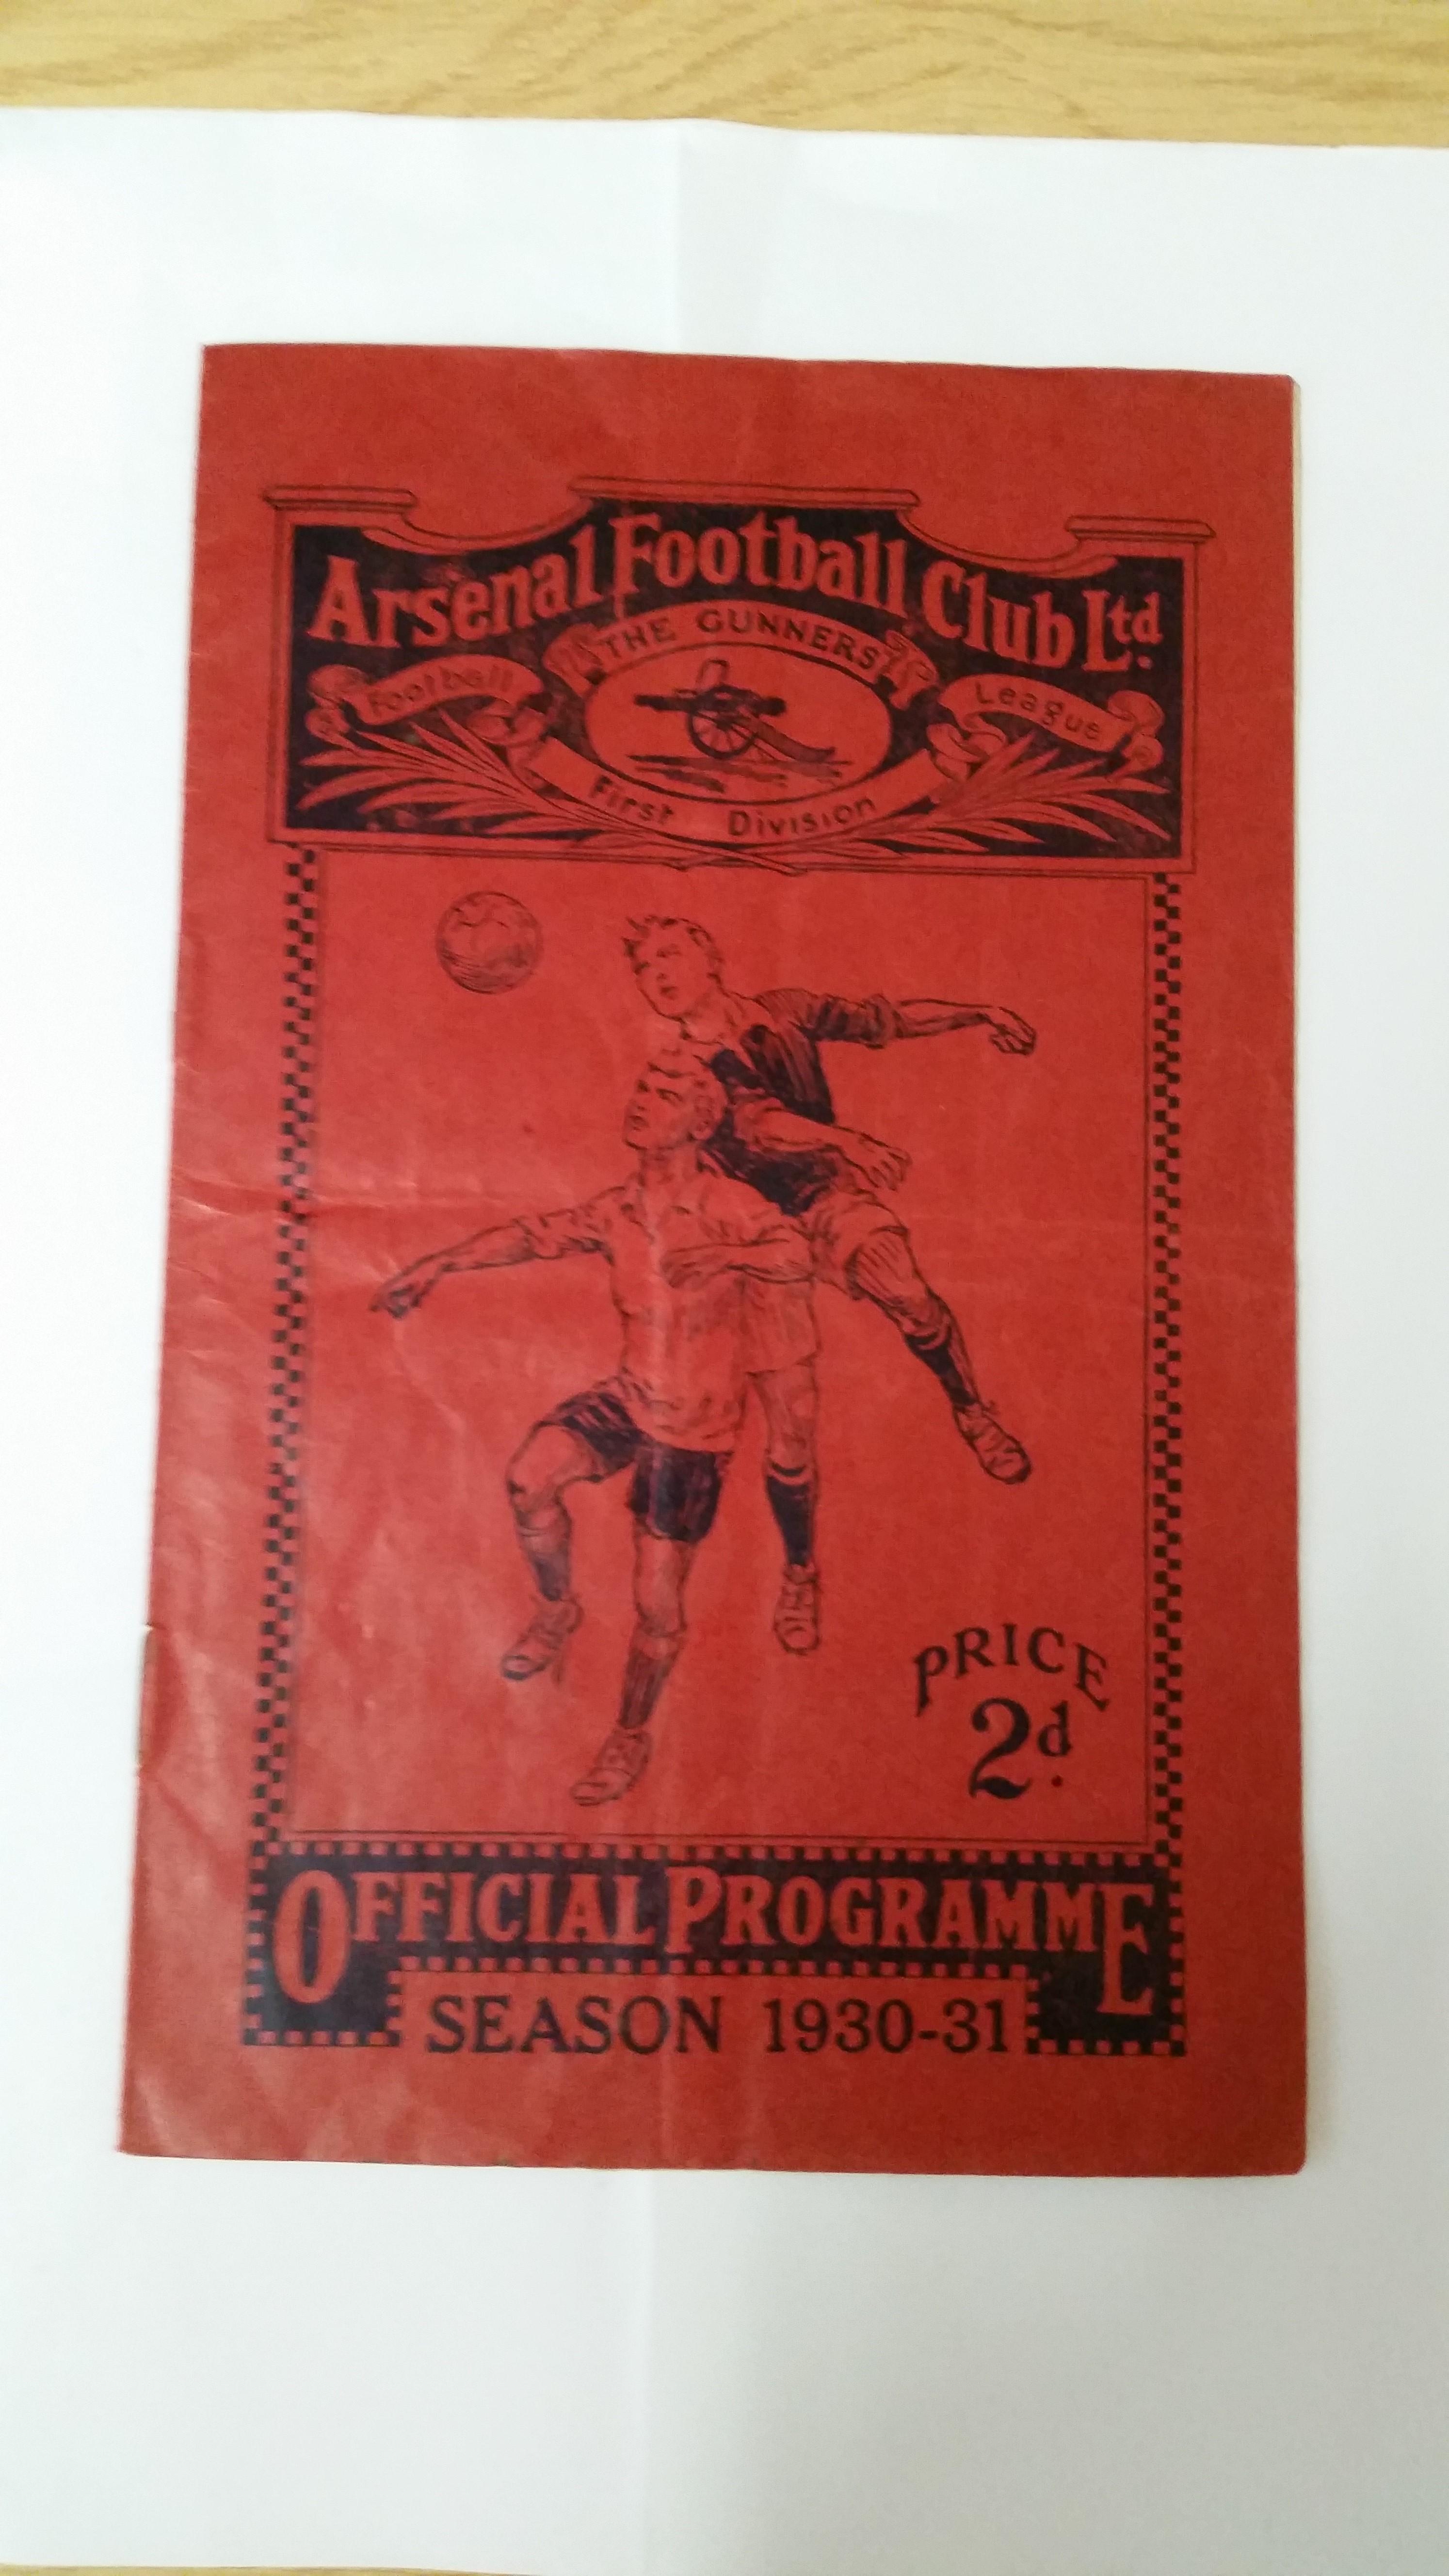 FOOTBALL, Arsenal home programme, v Portsmouth, 1930/1, minor folds, no writing, G